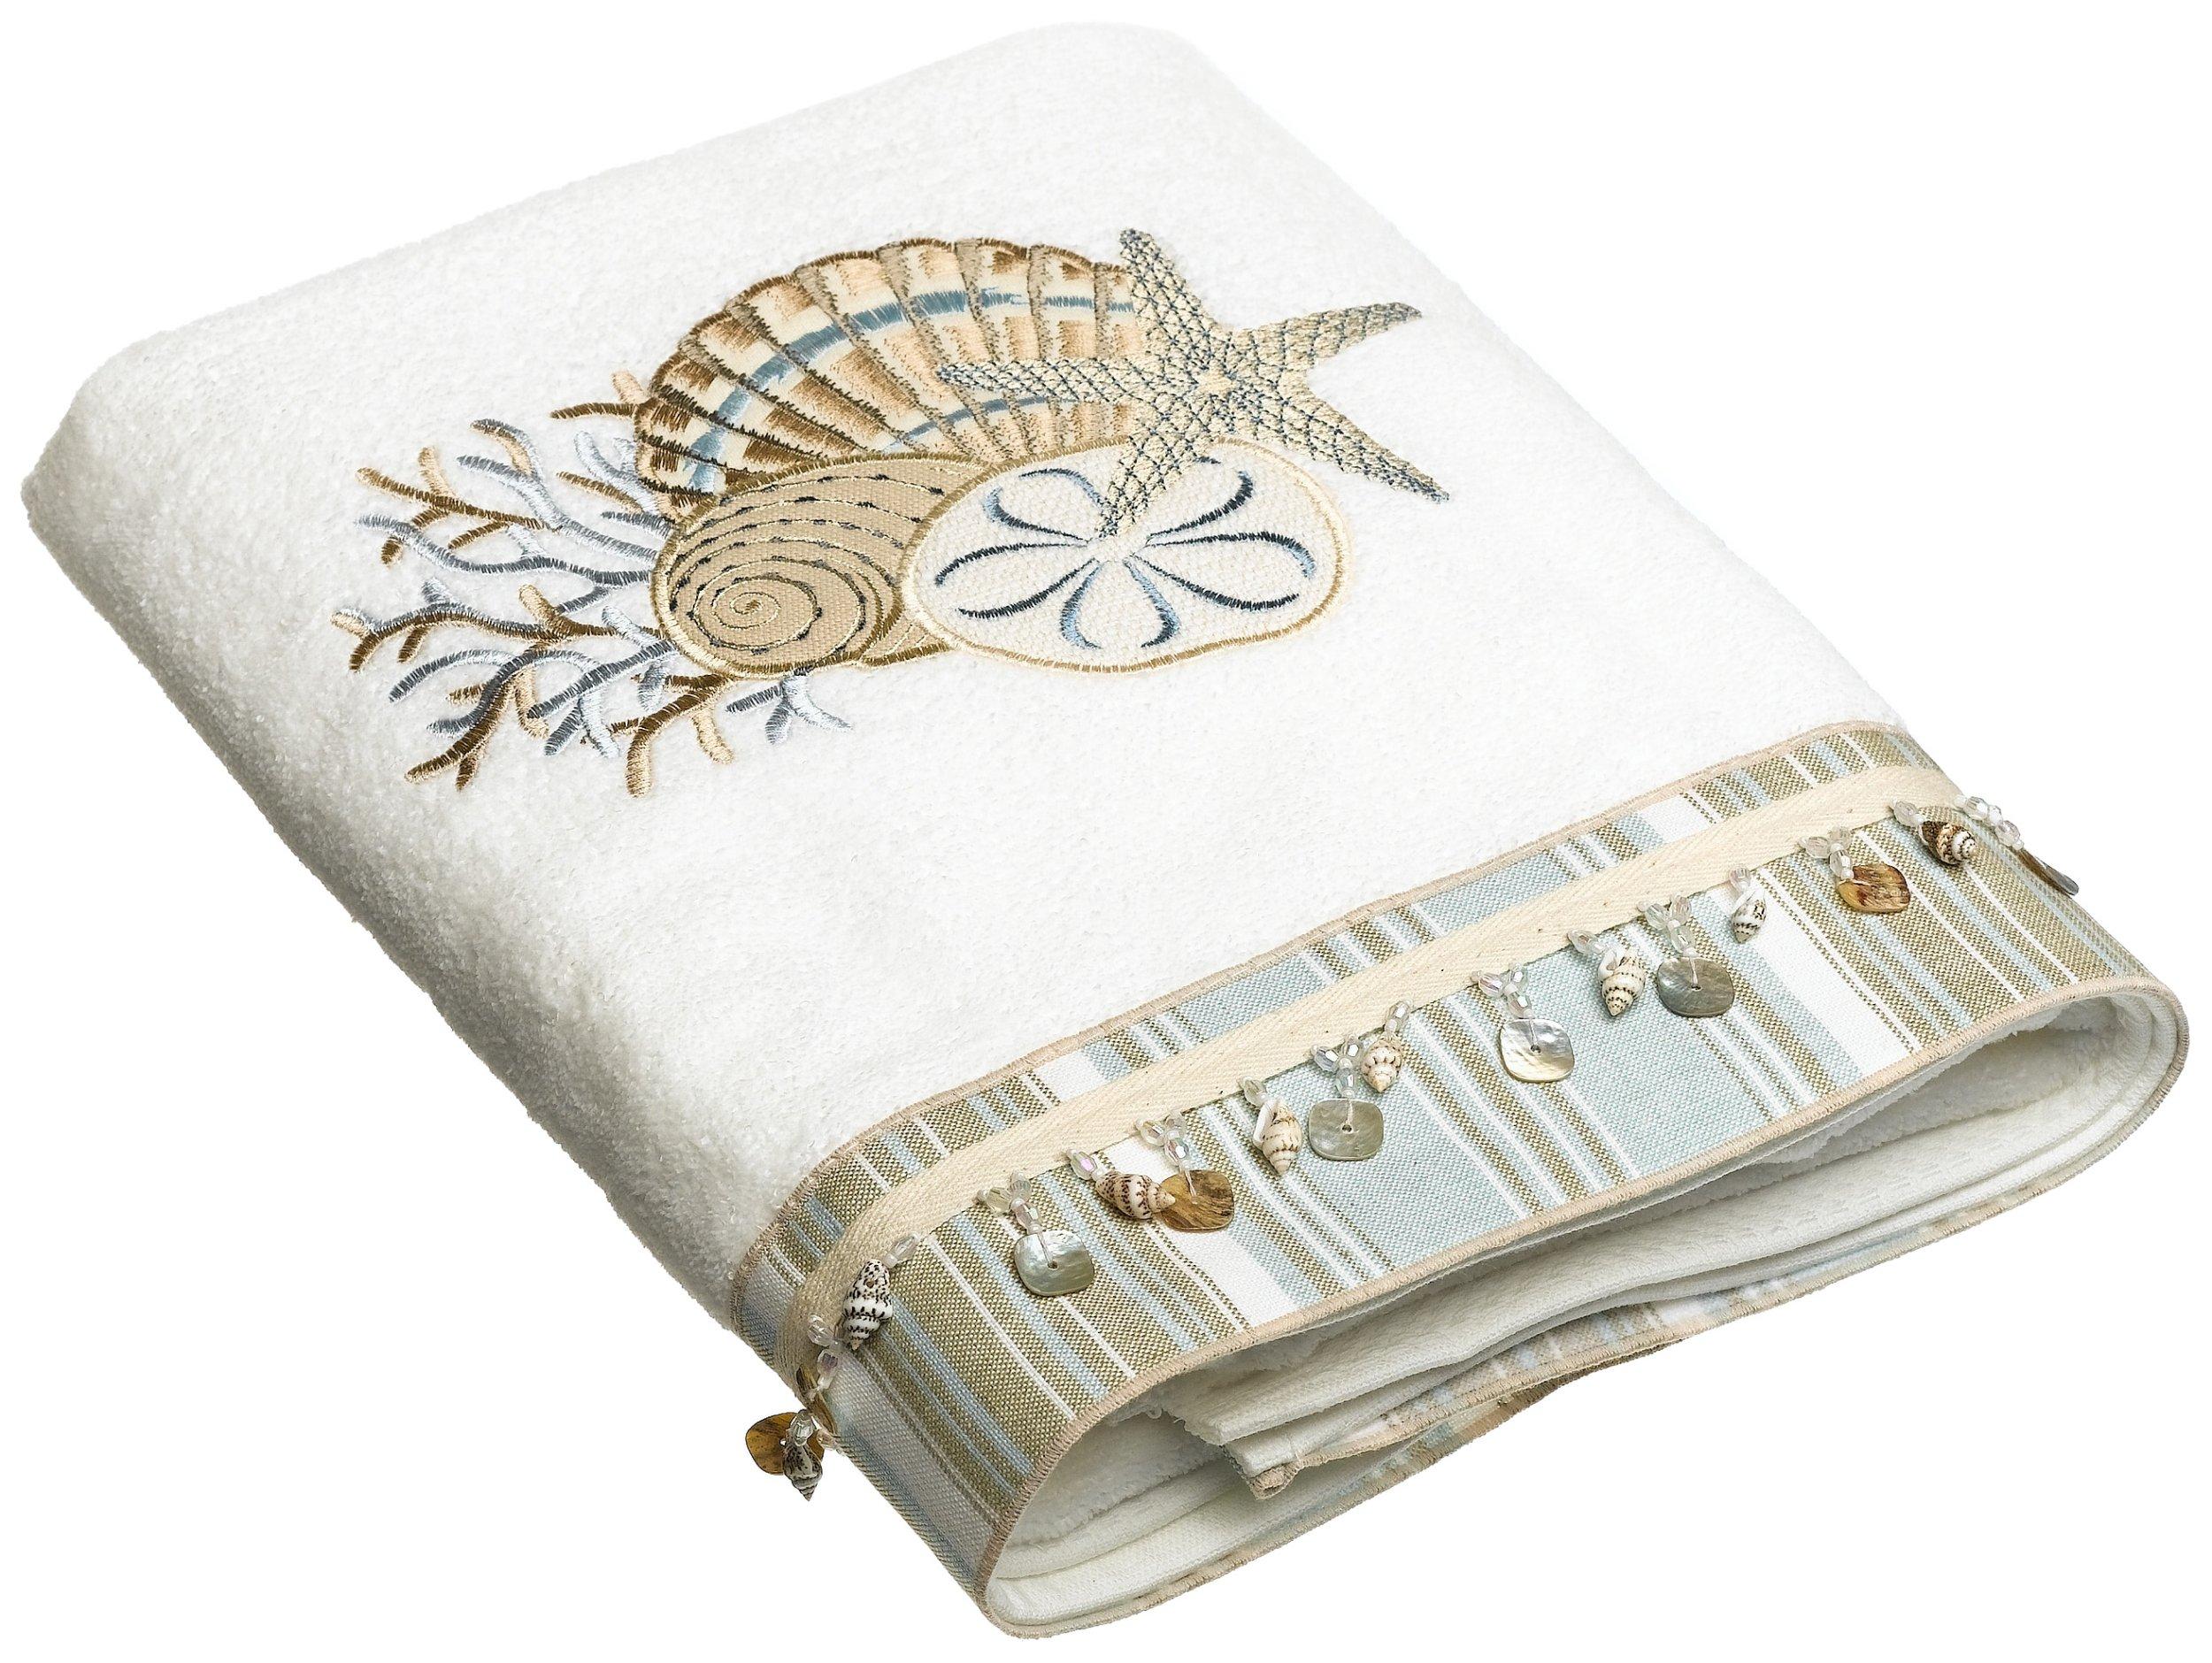 Avanti Linens By The Sea Bath Towel, White